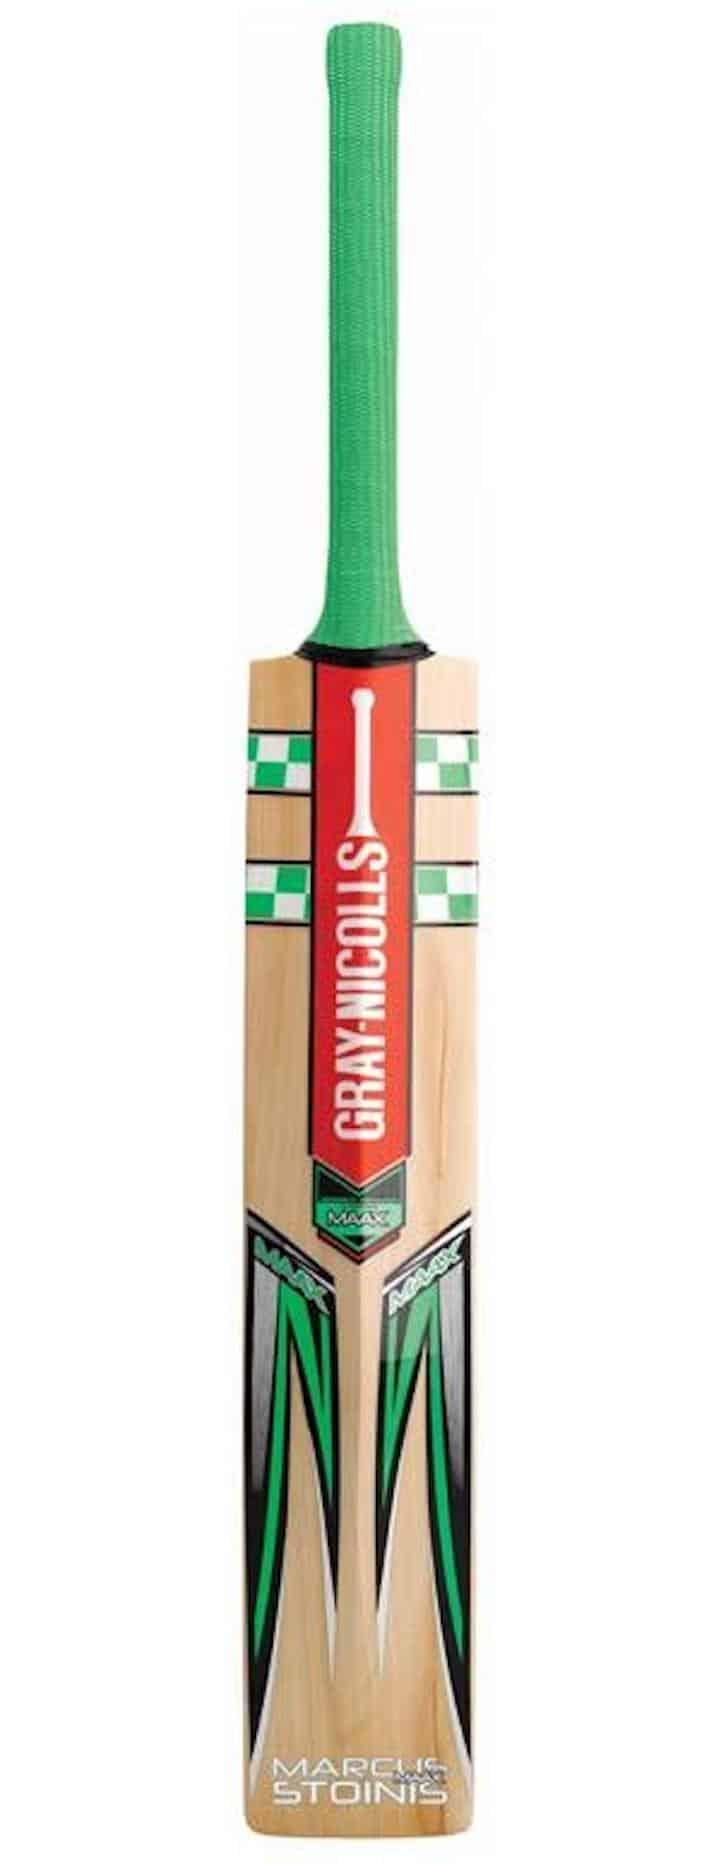 Maax Marcus stoinis Replica Gray Nicolls Cricket Bat